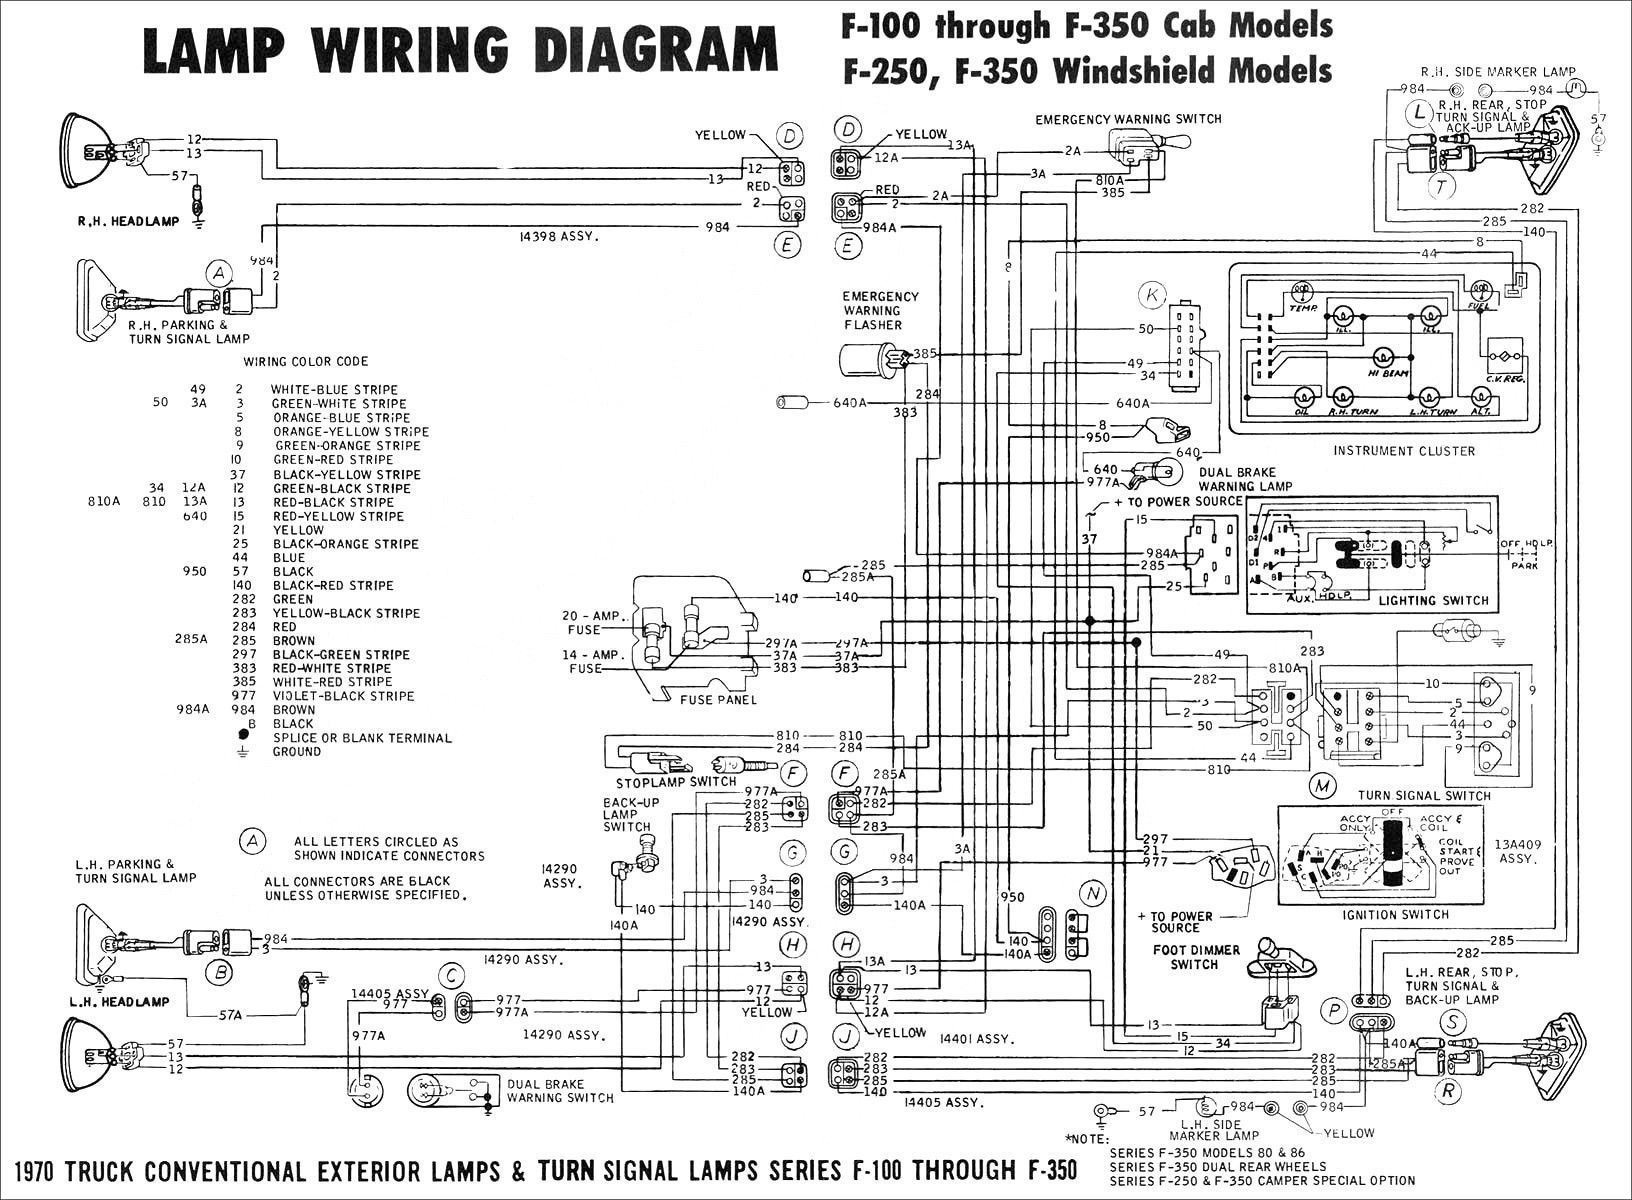 1995 Gmc Sierra Wiring Diagram In 2021 Trailer Wiring Diagram Electrical Wiring Diagram Circuit Diagram